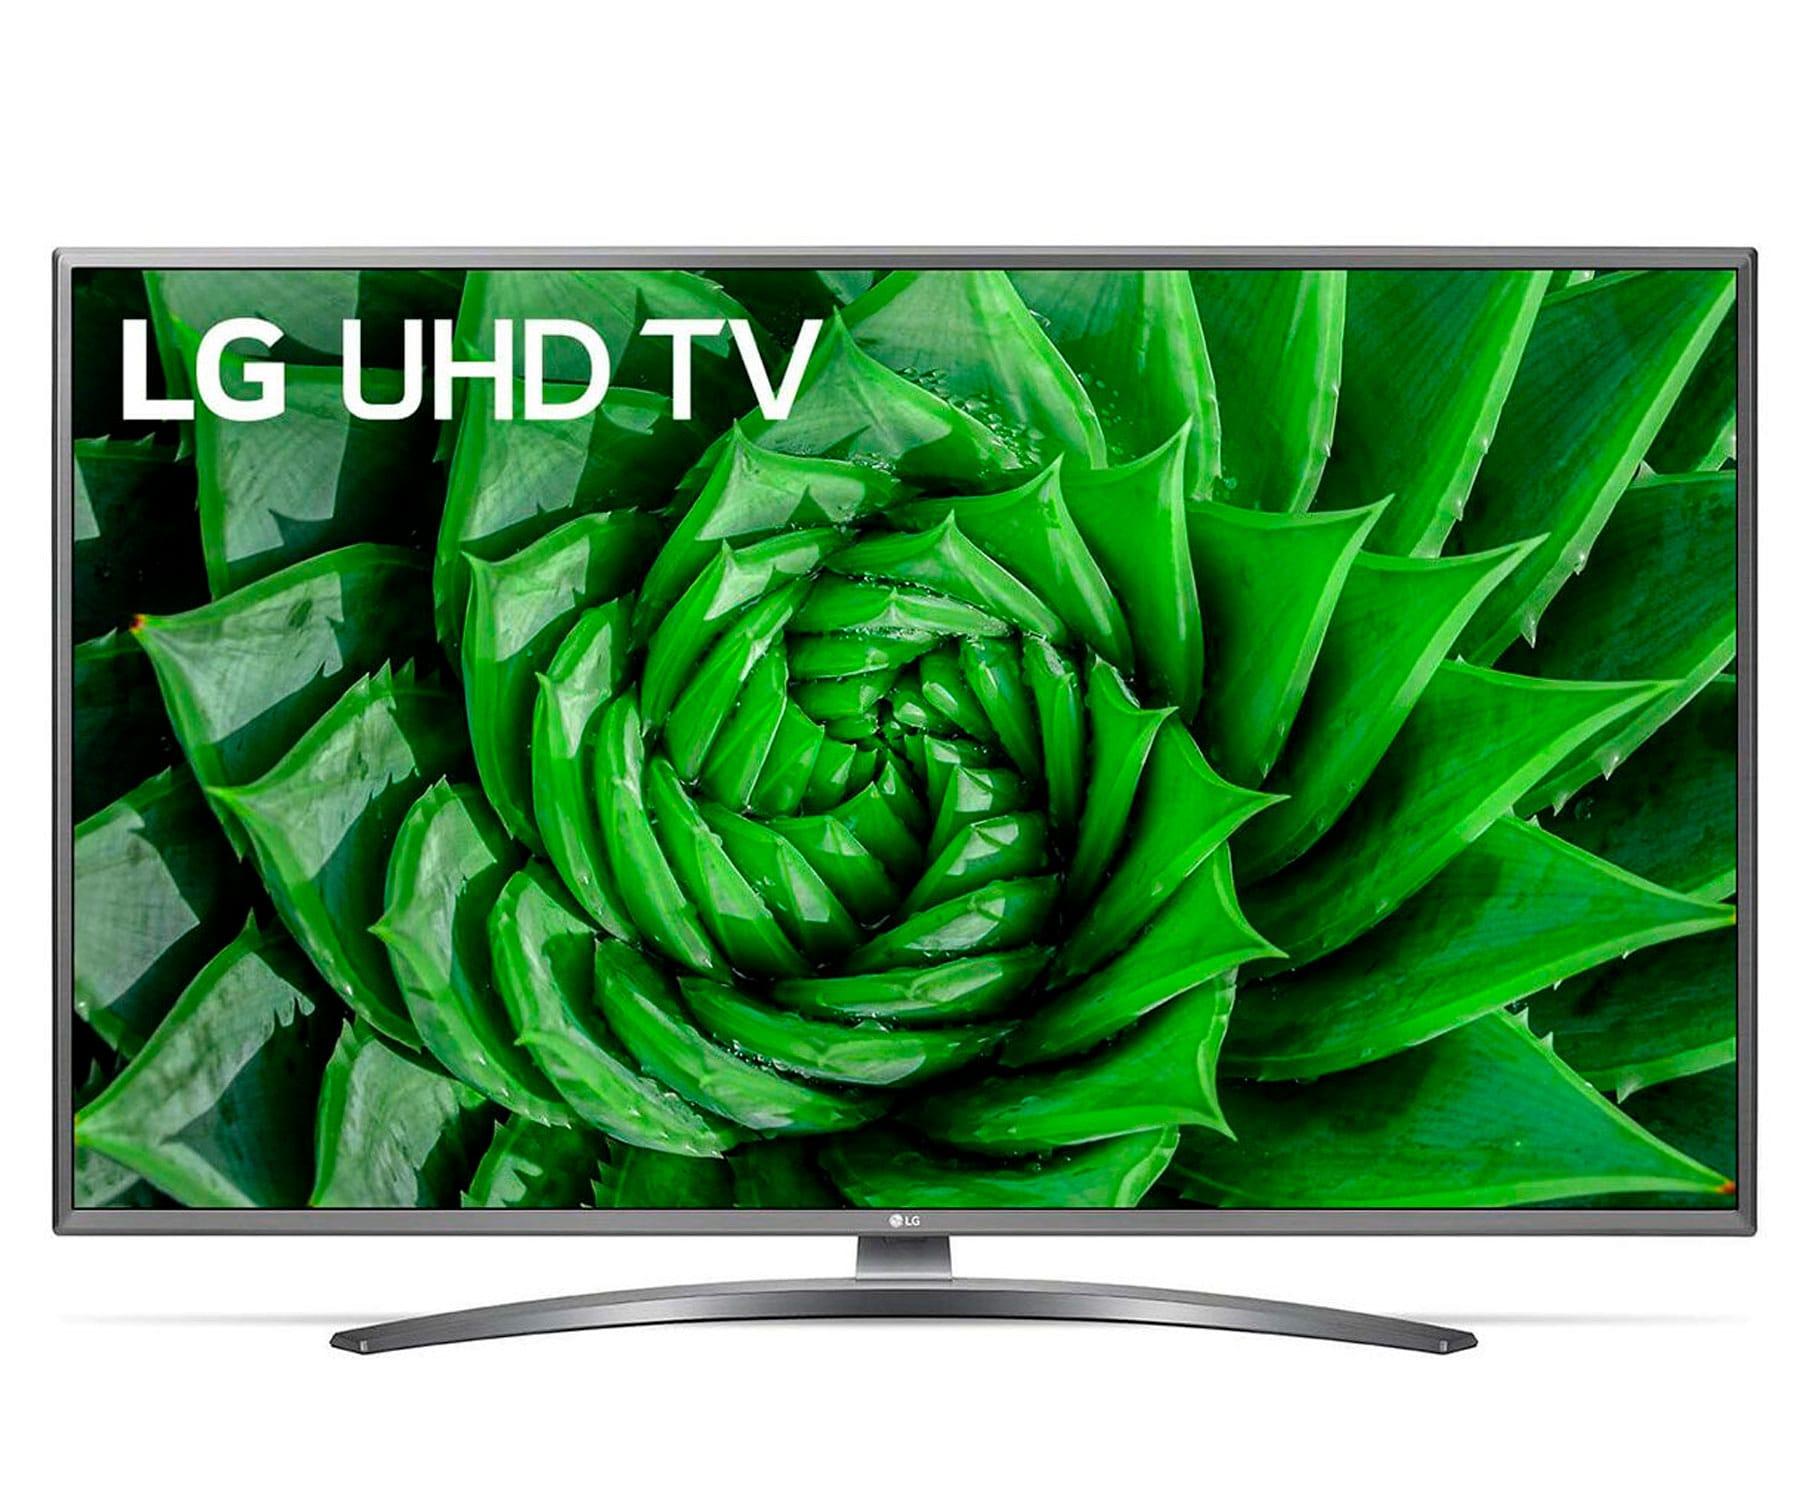 Lg 43UN81003LB TELEVISOR 43'' LED UHD 4K SMART TV WEBOS 5.0 WIFI HDMI BLUETOOTH